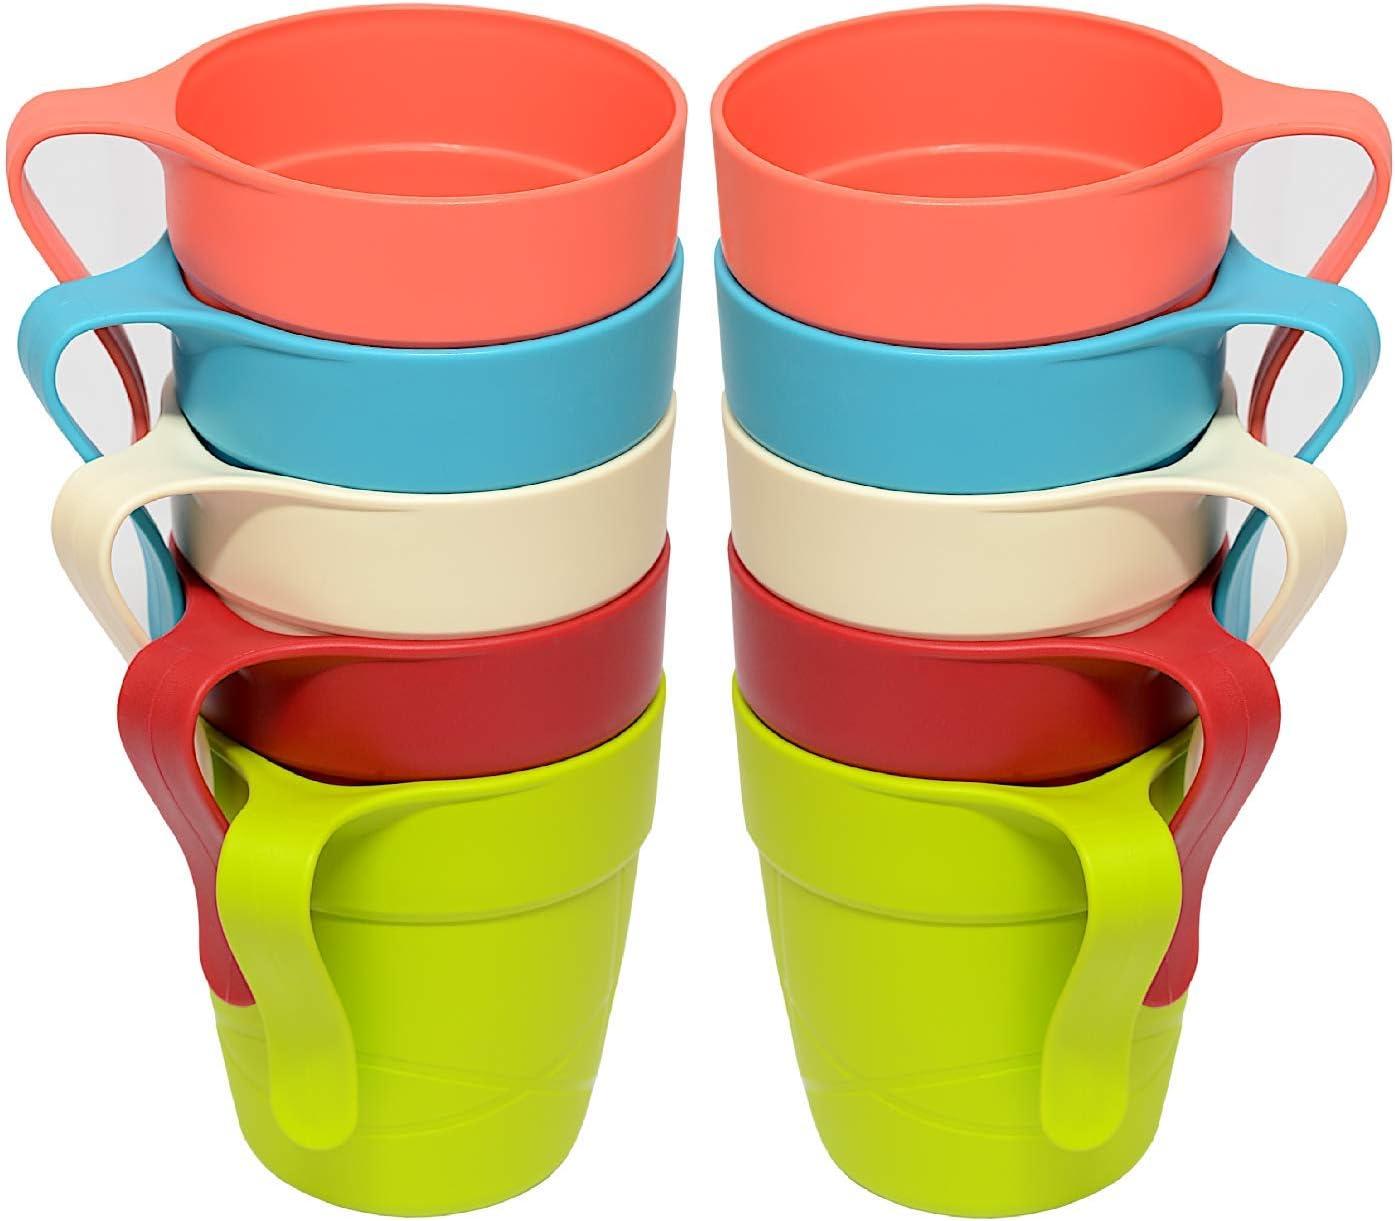 Engelland 10er Pack Kunststoffbecher//Trinkbecher aus Kunststoff Kinderbecher Kaffeebecher Bunte Mischung BPA Frei